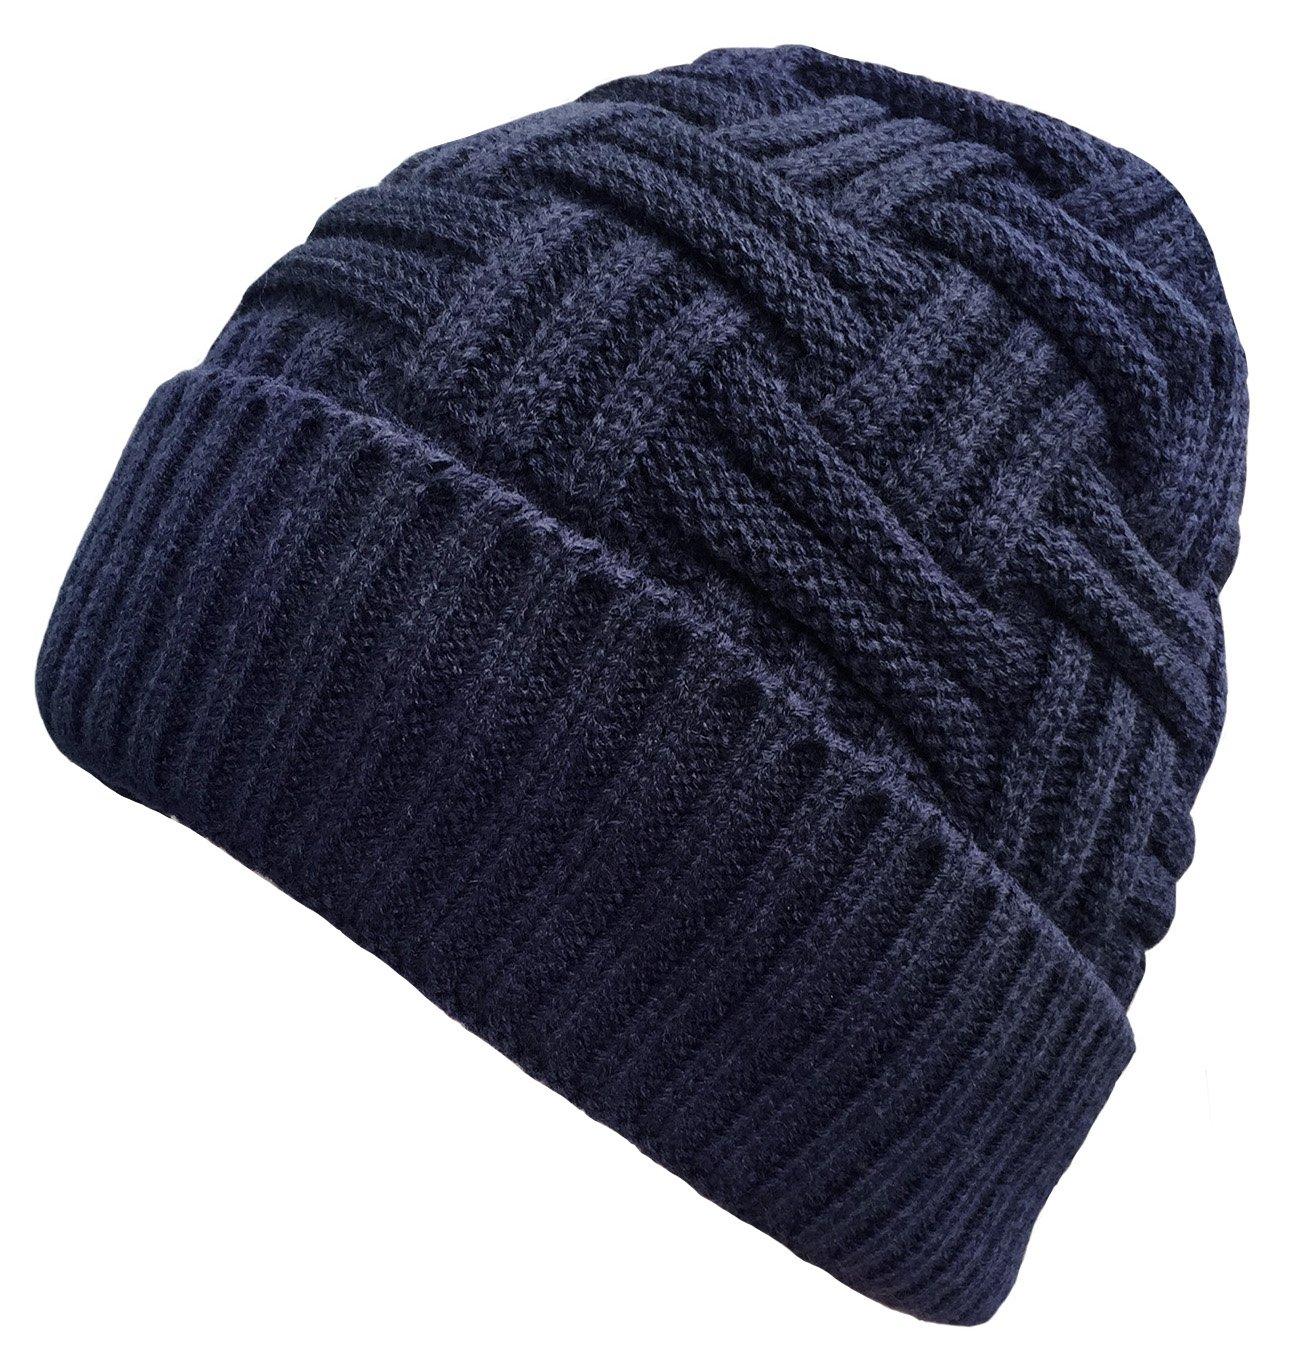 Loritta Mens Winter Warm Knitting Hats Wool Baggy Slouchy Beanie Hat Skull Cap CLT-023-1